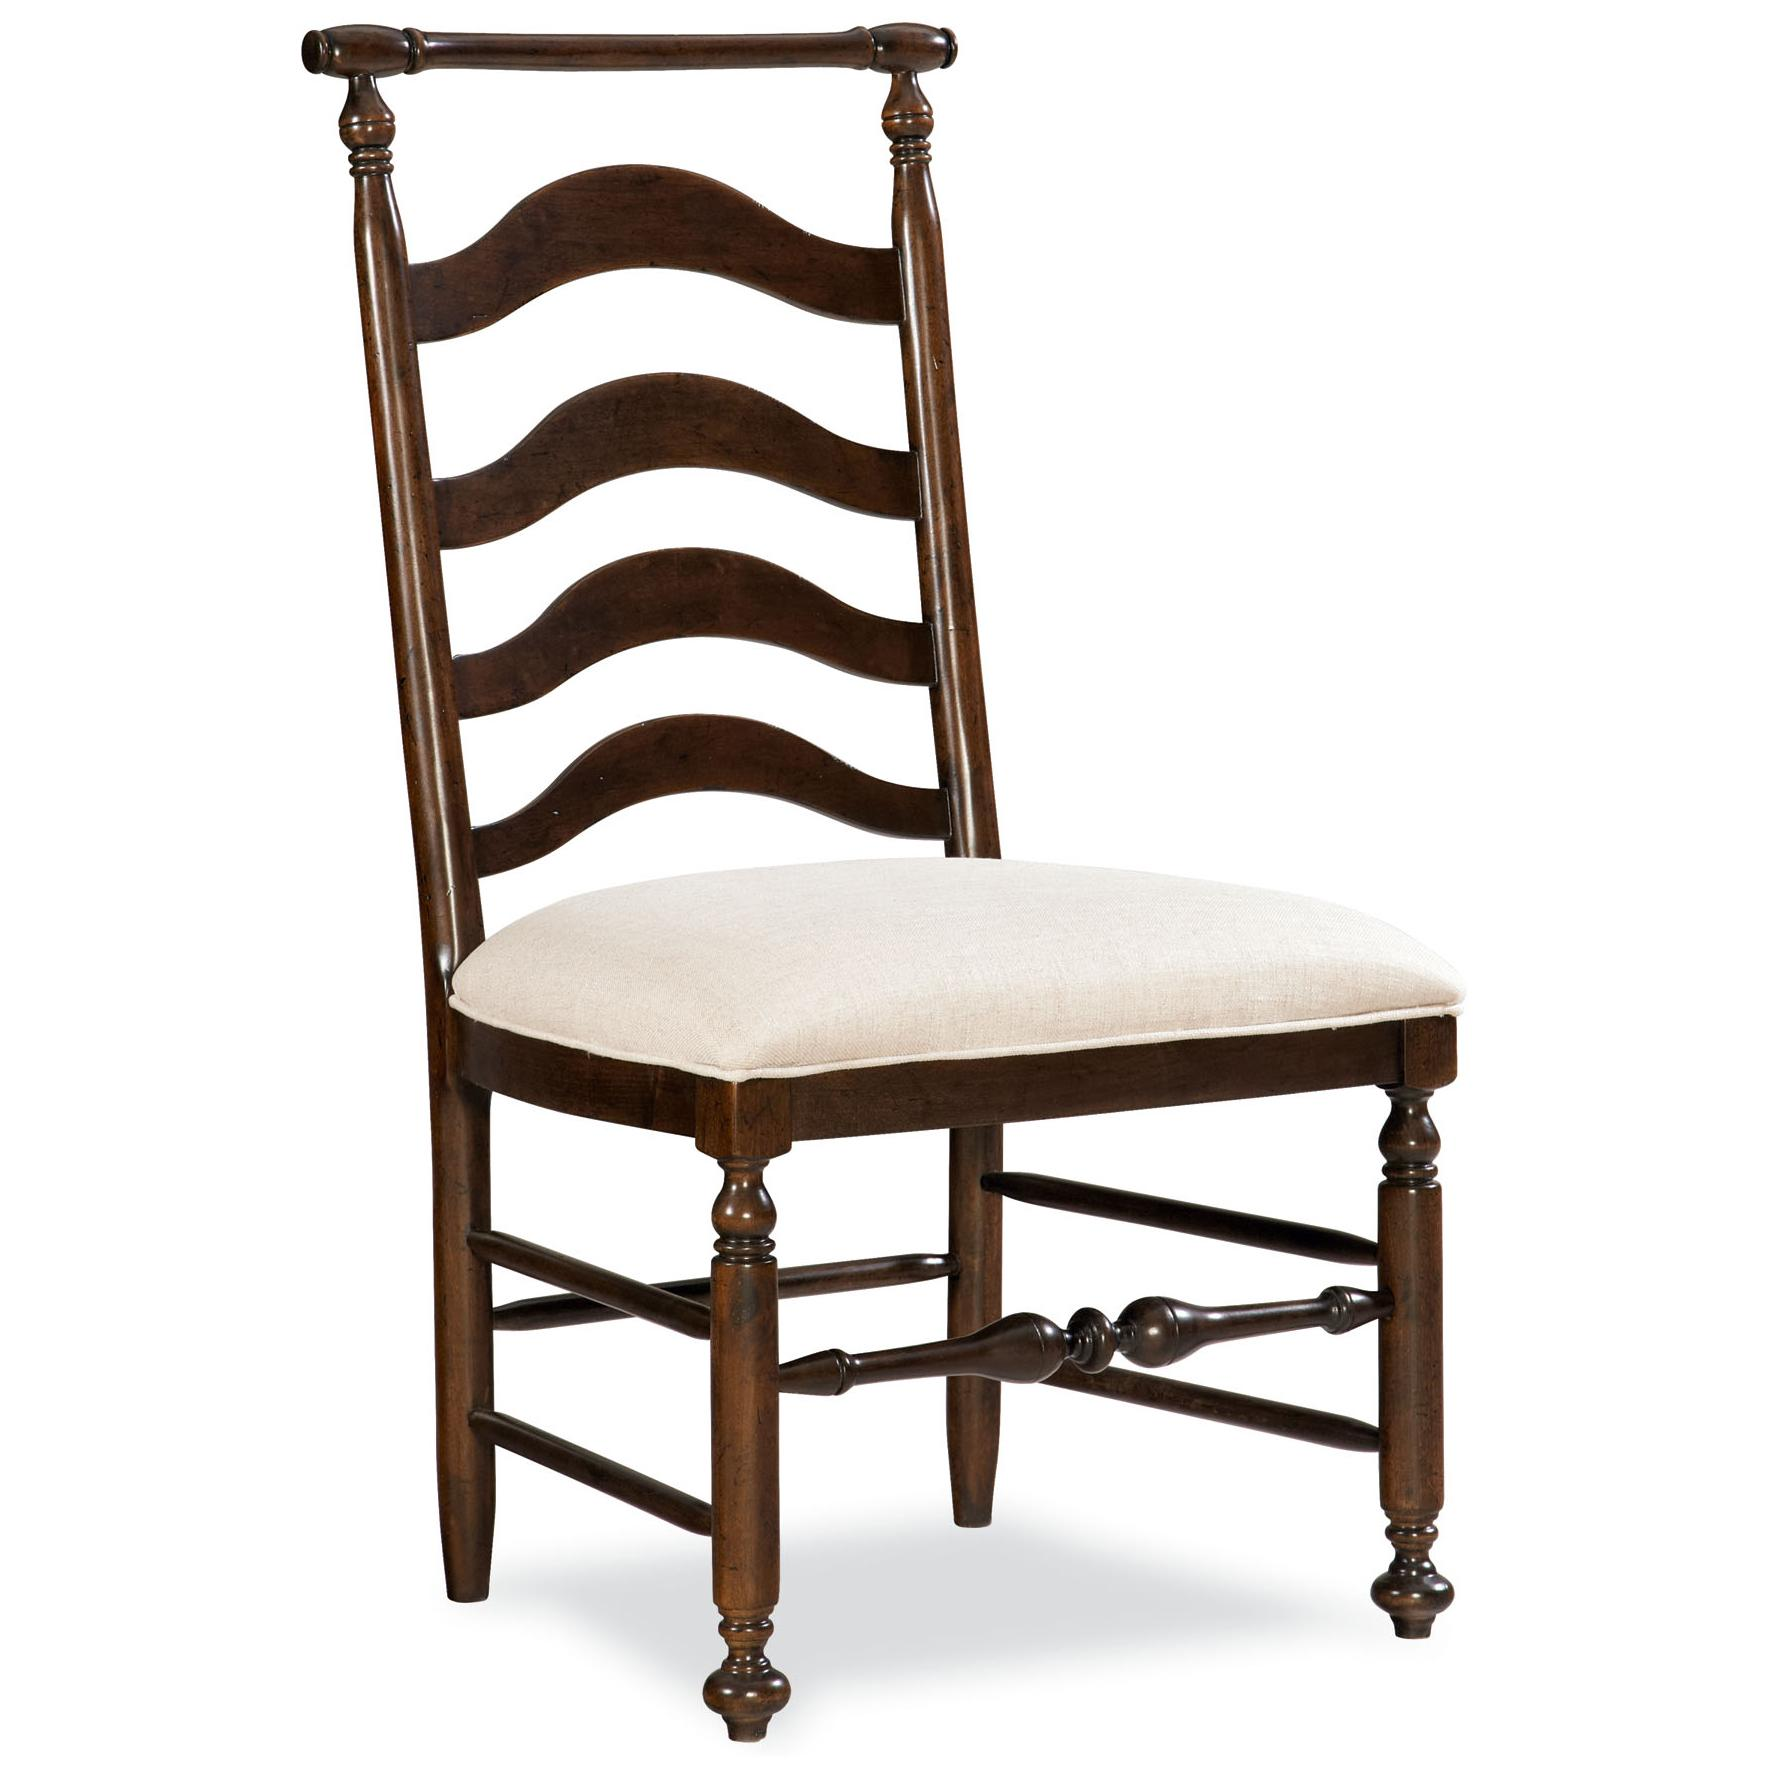 Morris Home Furnishings Riverside Casegoods / Riverside Dining Side Chair - Item Number: 393634-RTA